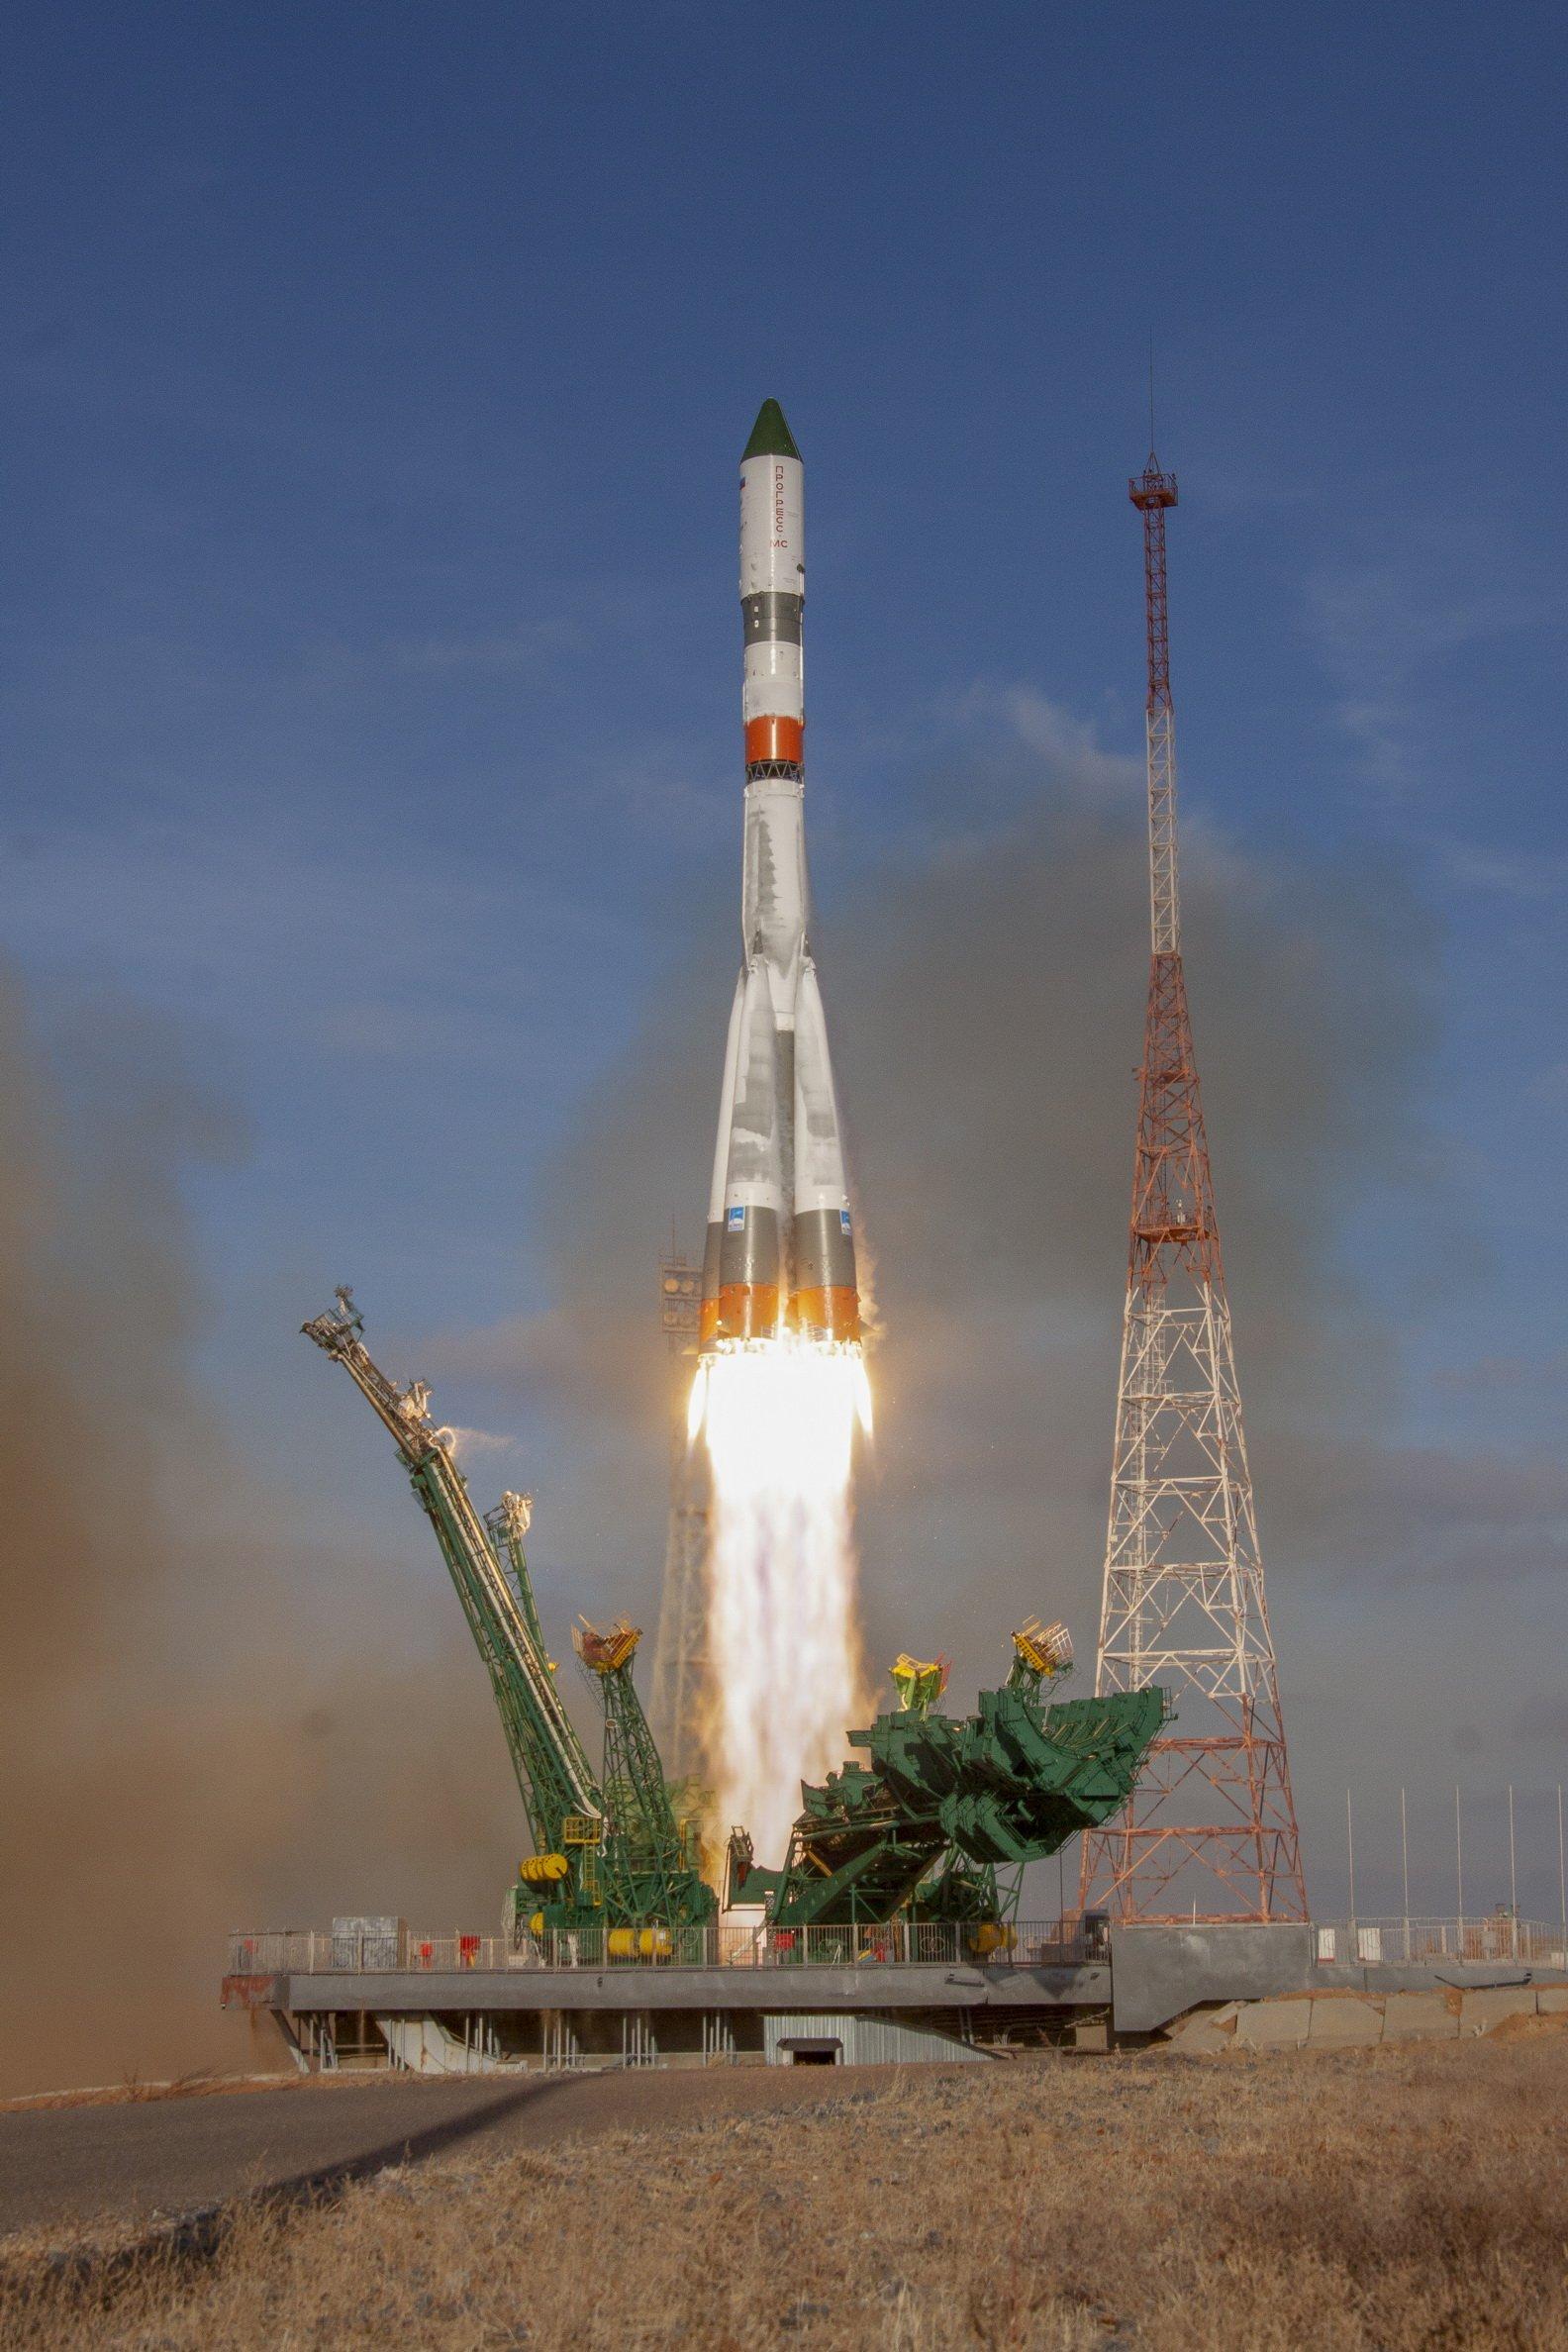 Imaginea 1: Lansarea capsulei Progress MS-13 spre ISS la bordul unei rachete Soyuz-2.1a de la Baikonur (Sursa foto: Roscosmos)